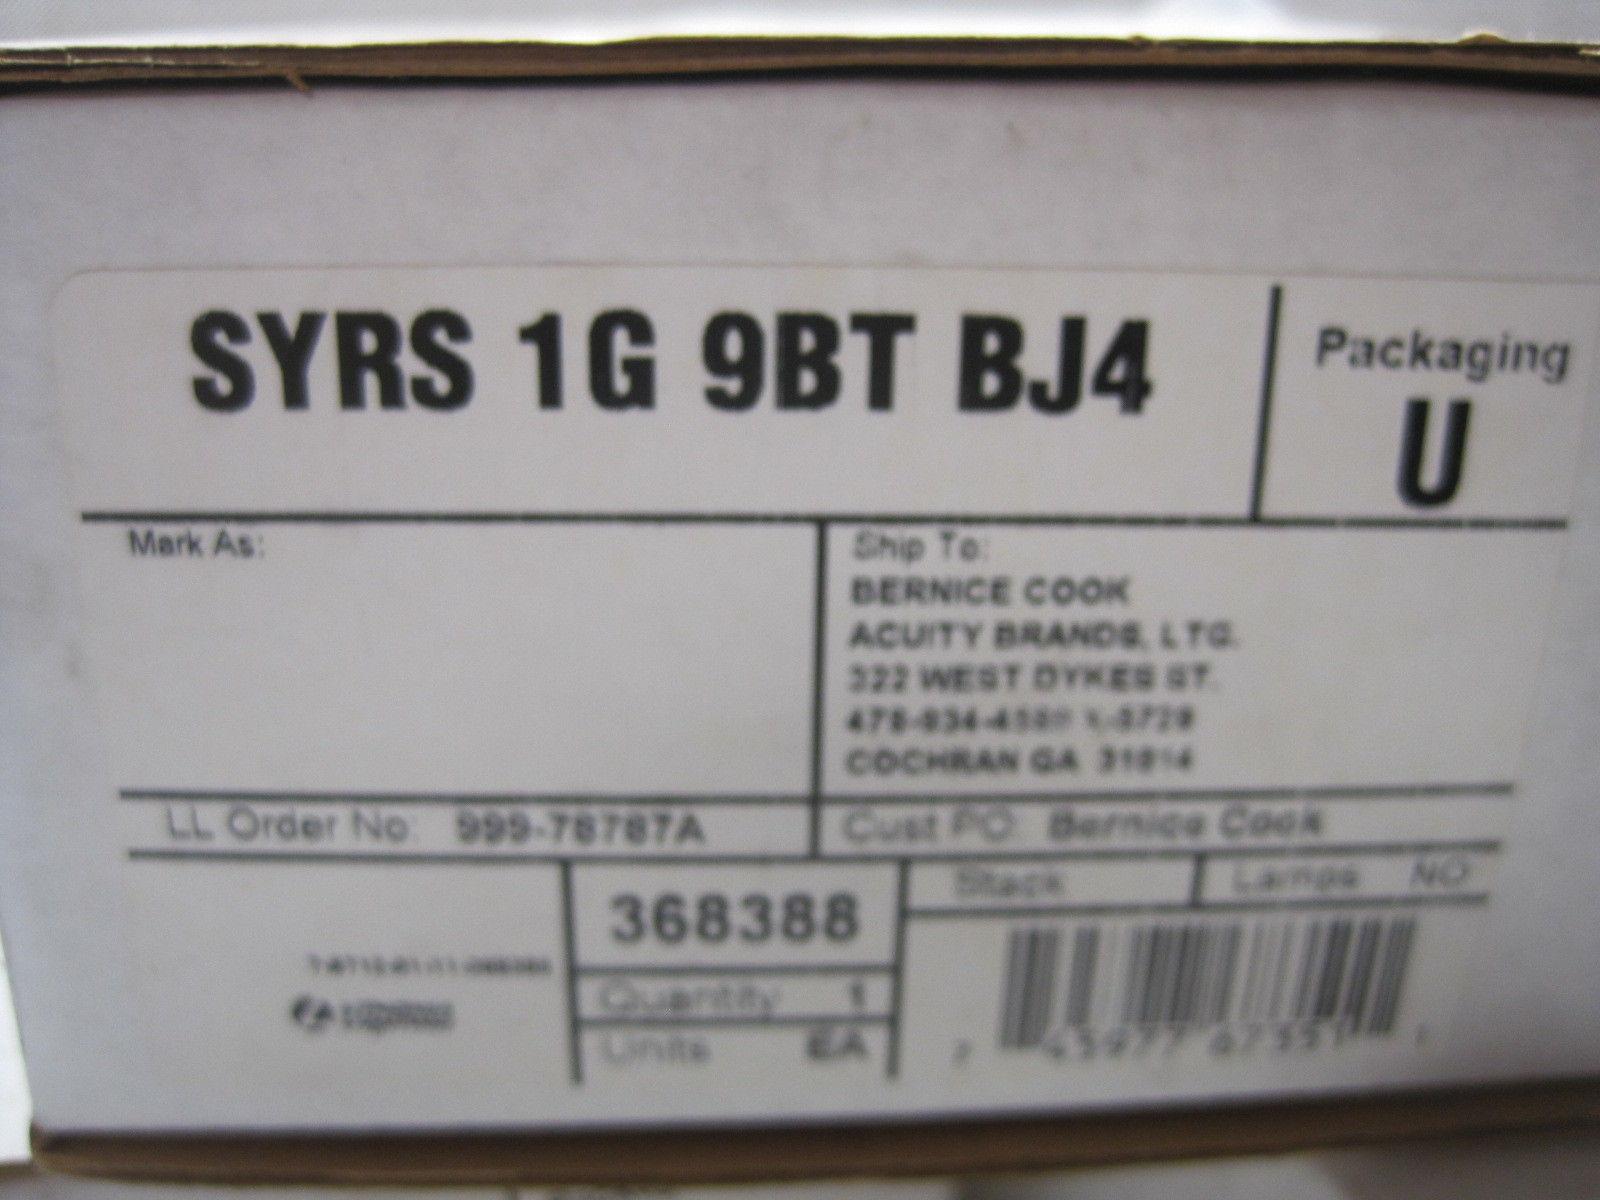 NEW LITHONIA LIGHTING SYRS-1G-9BT-BJ4 WALL STATION SYRS1G9BTBJ4